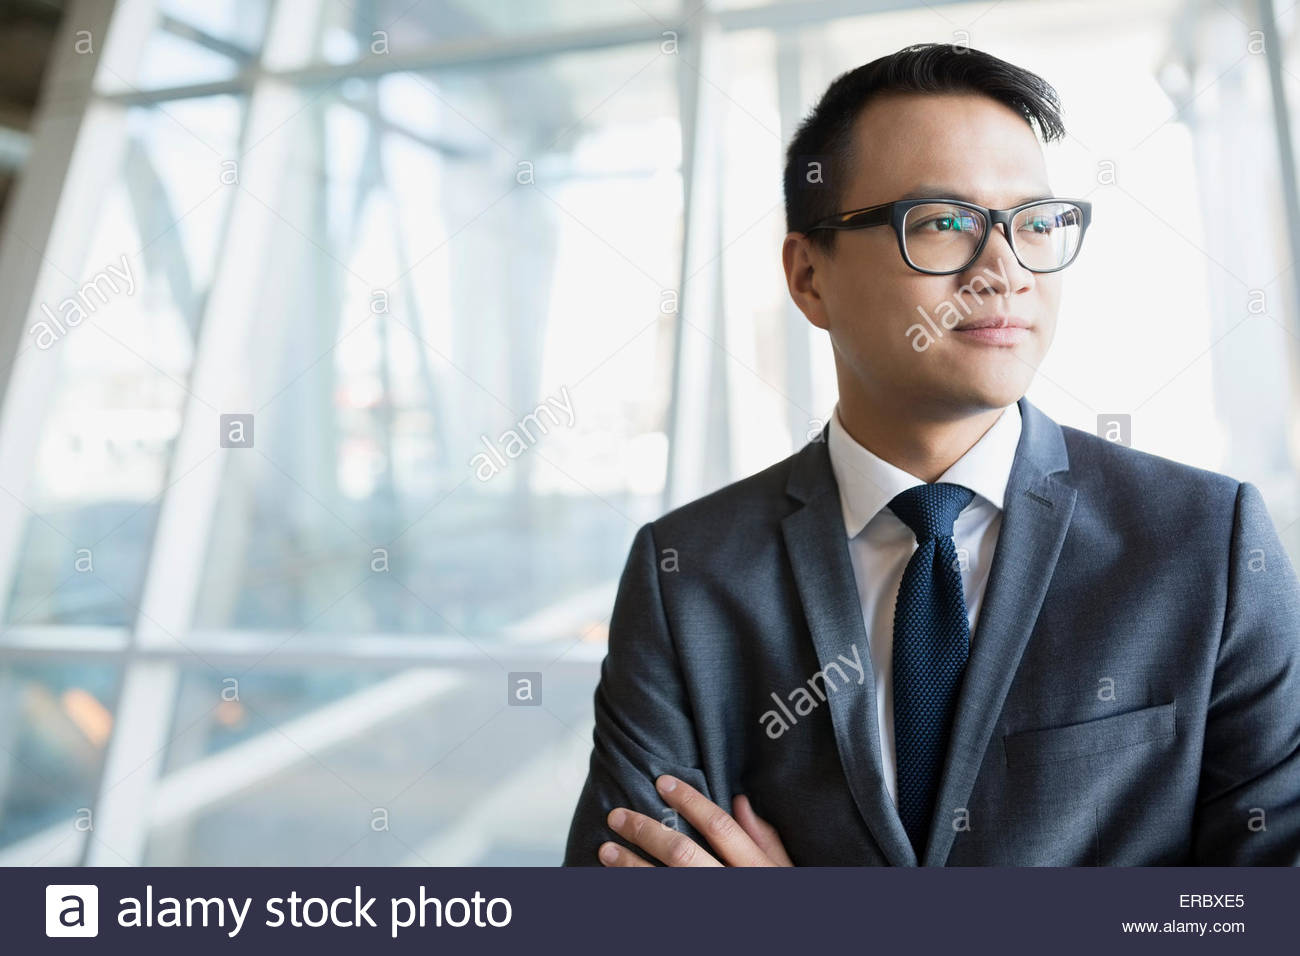 Pensive businessman in suit looking away - Stock Image